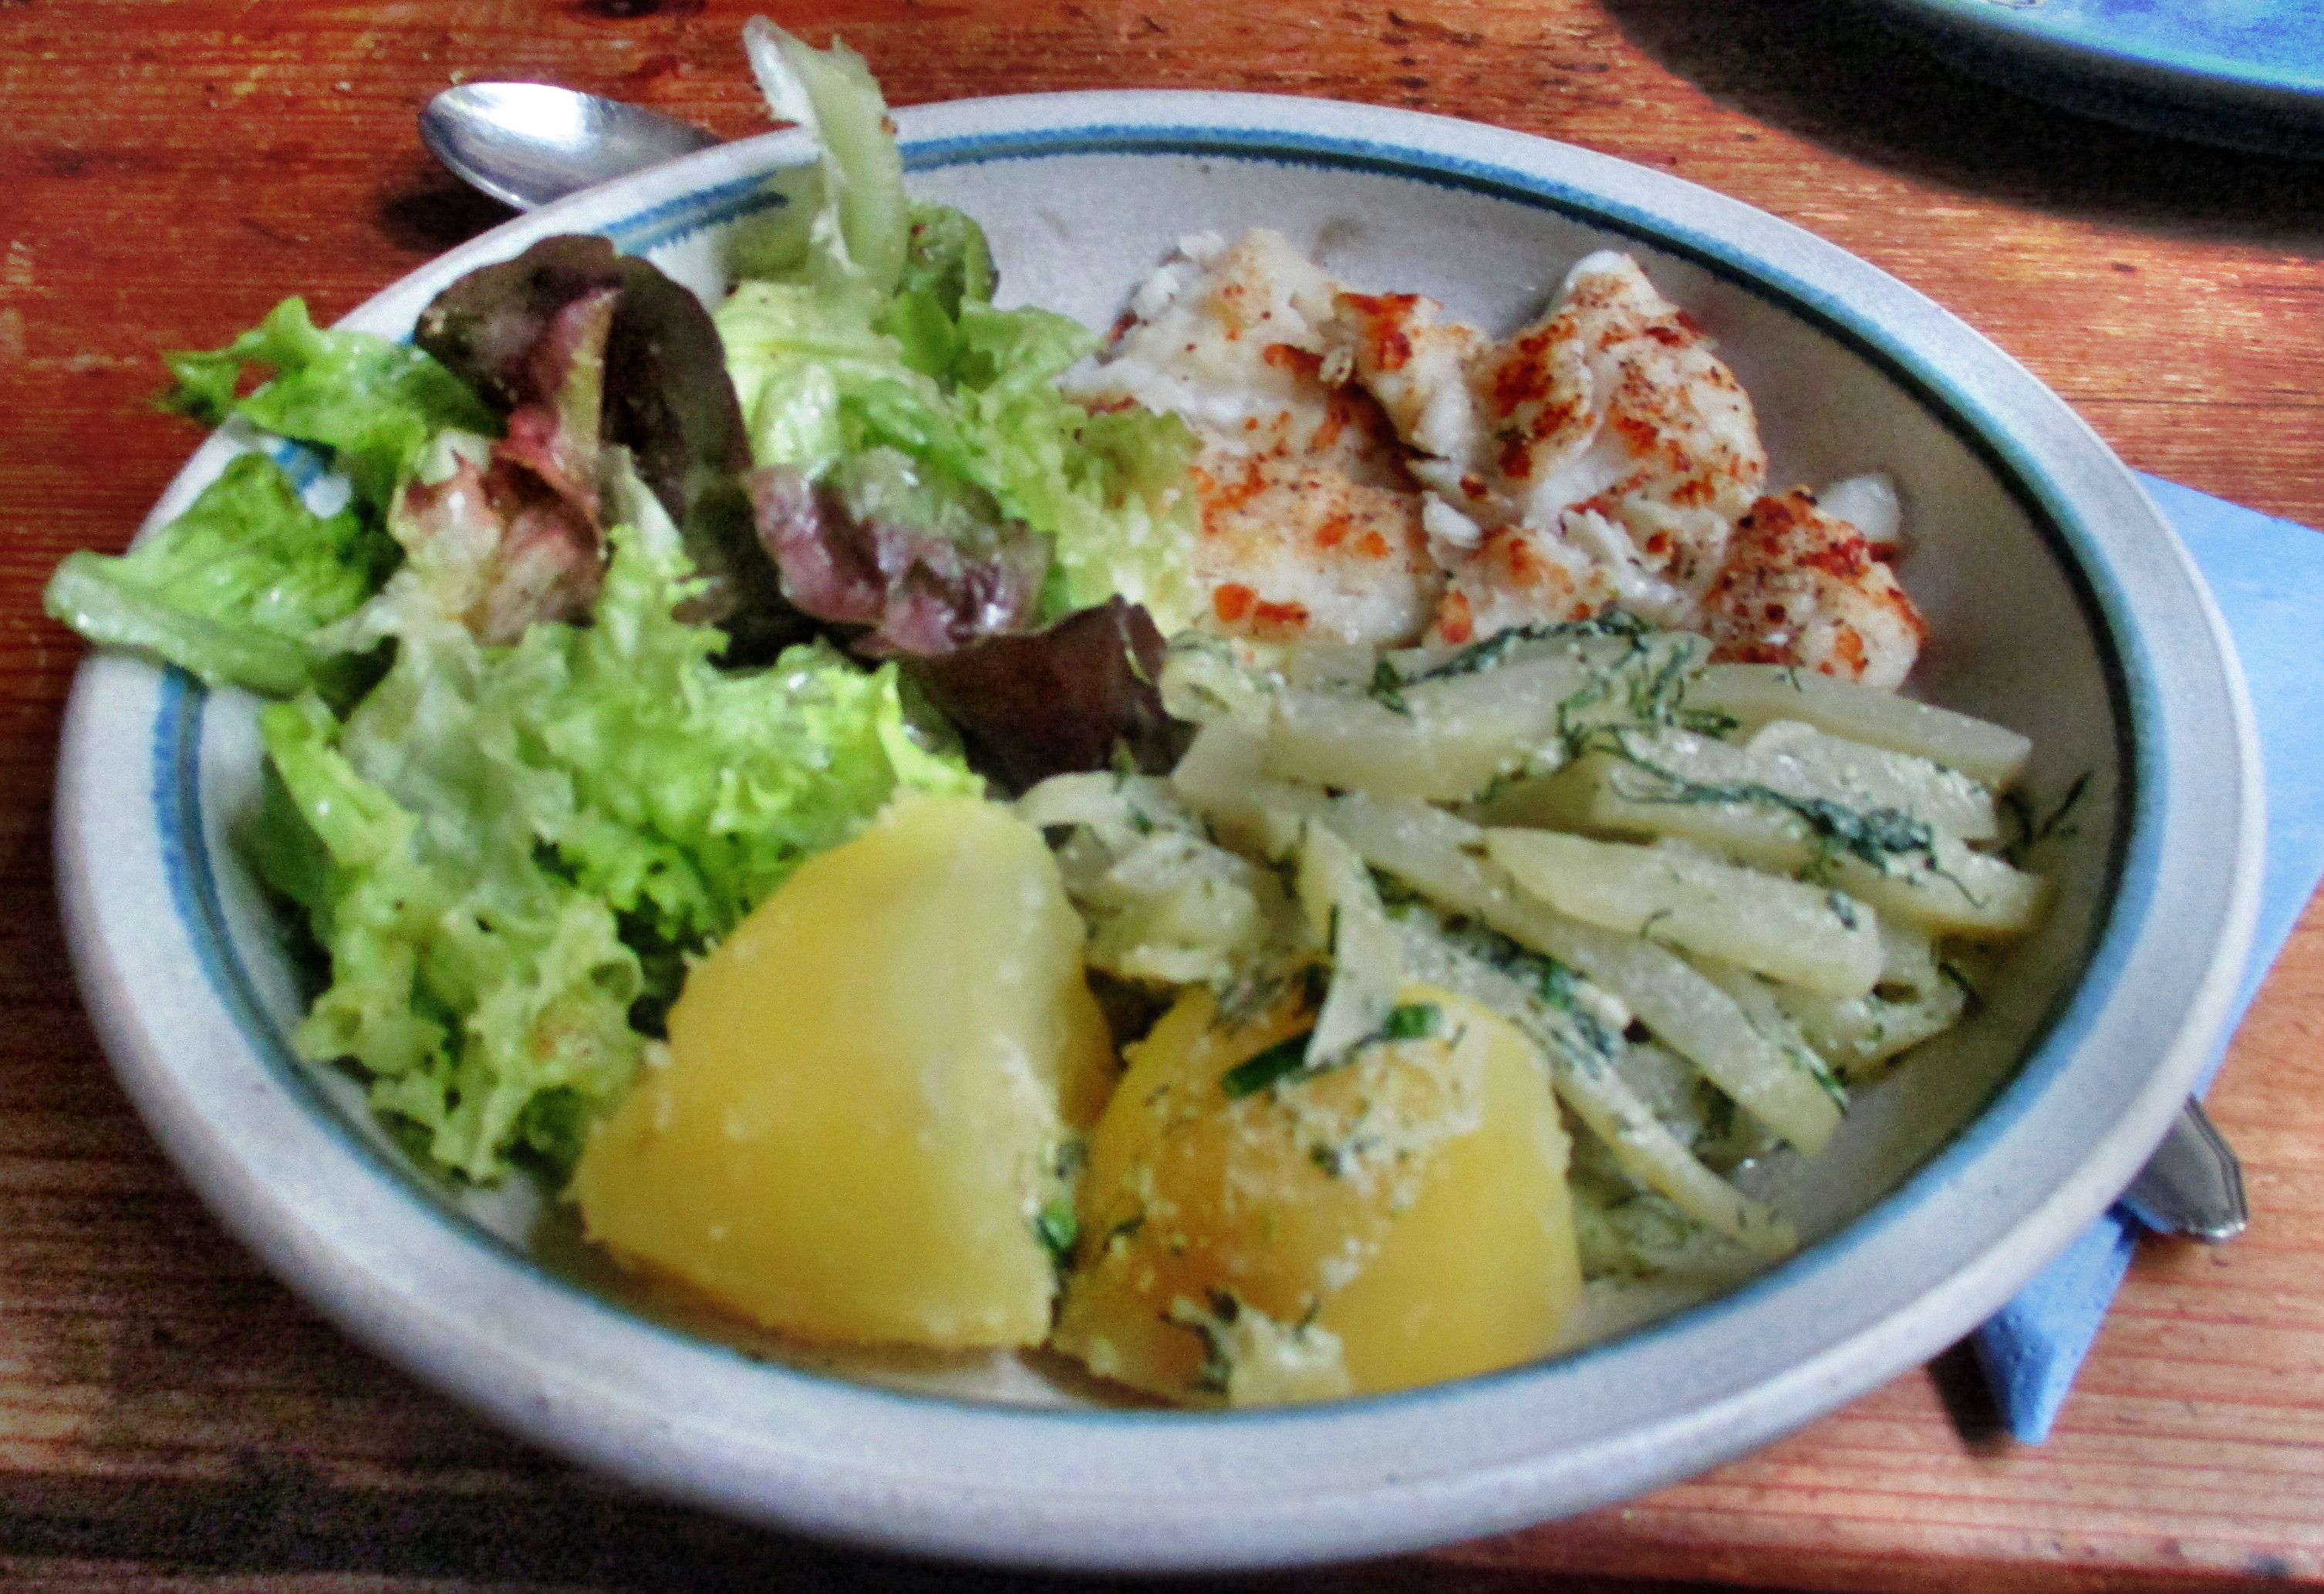 Kabeljau,Kohlrabigemüse,Salzkartoffeln,Salat -9.6.15   (13)